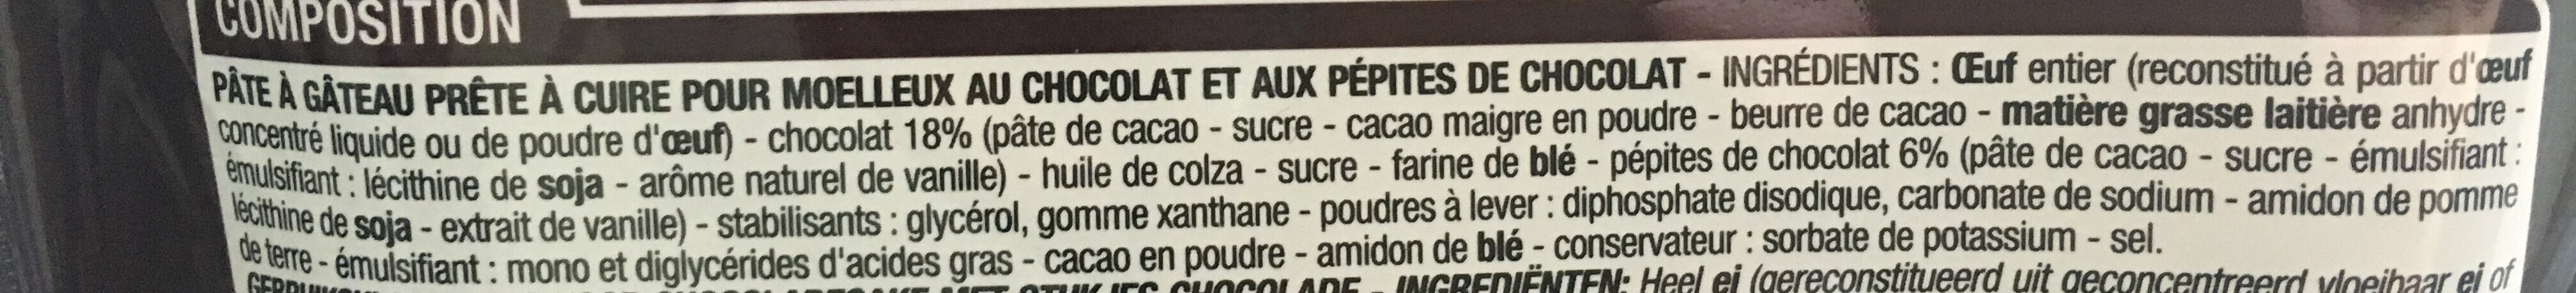 Préparation pour moelleux au chocolat - Ingrediënten